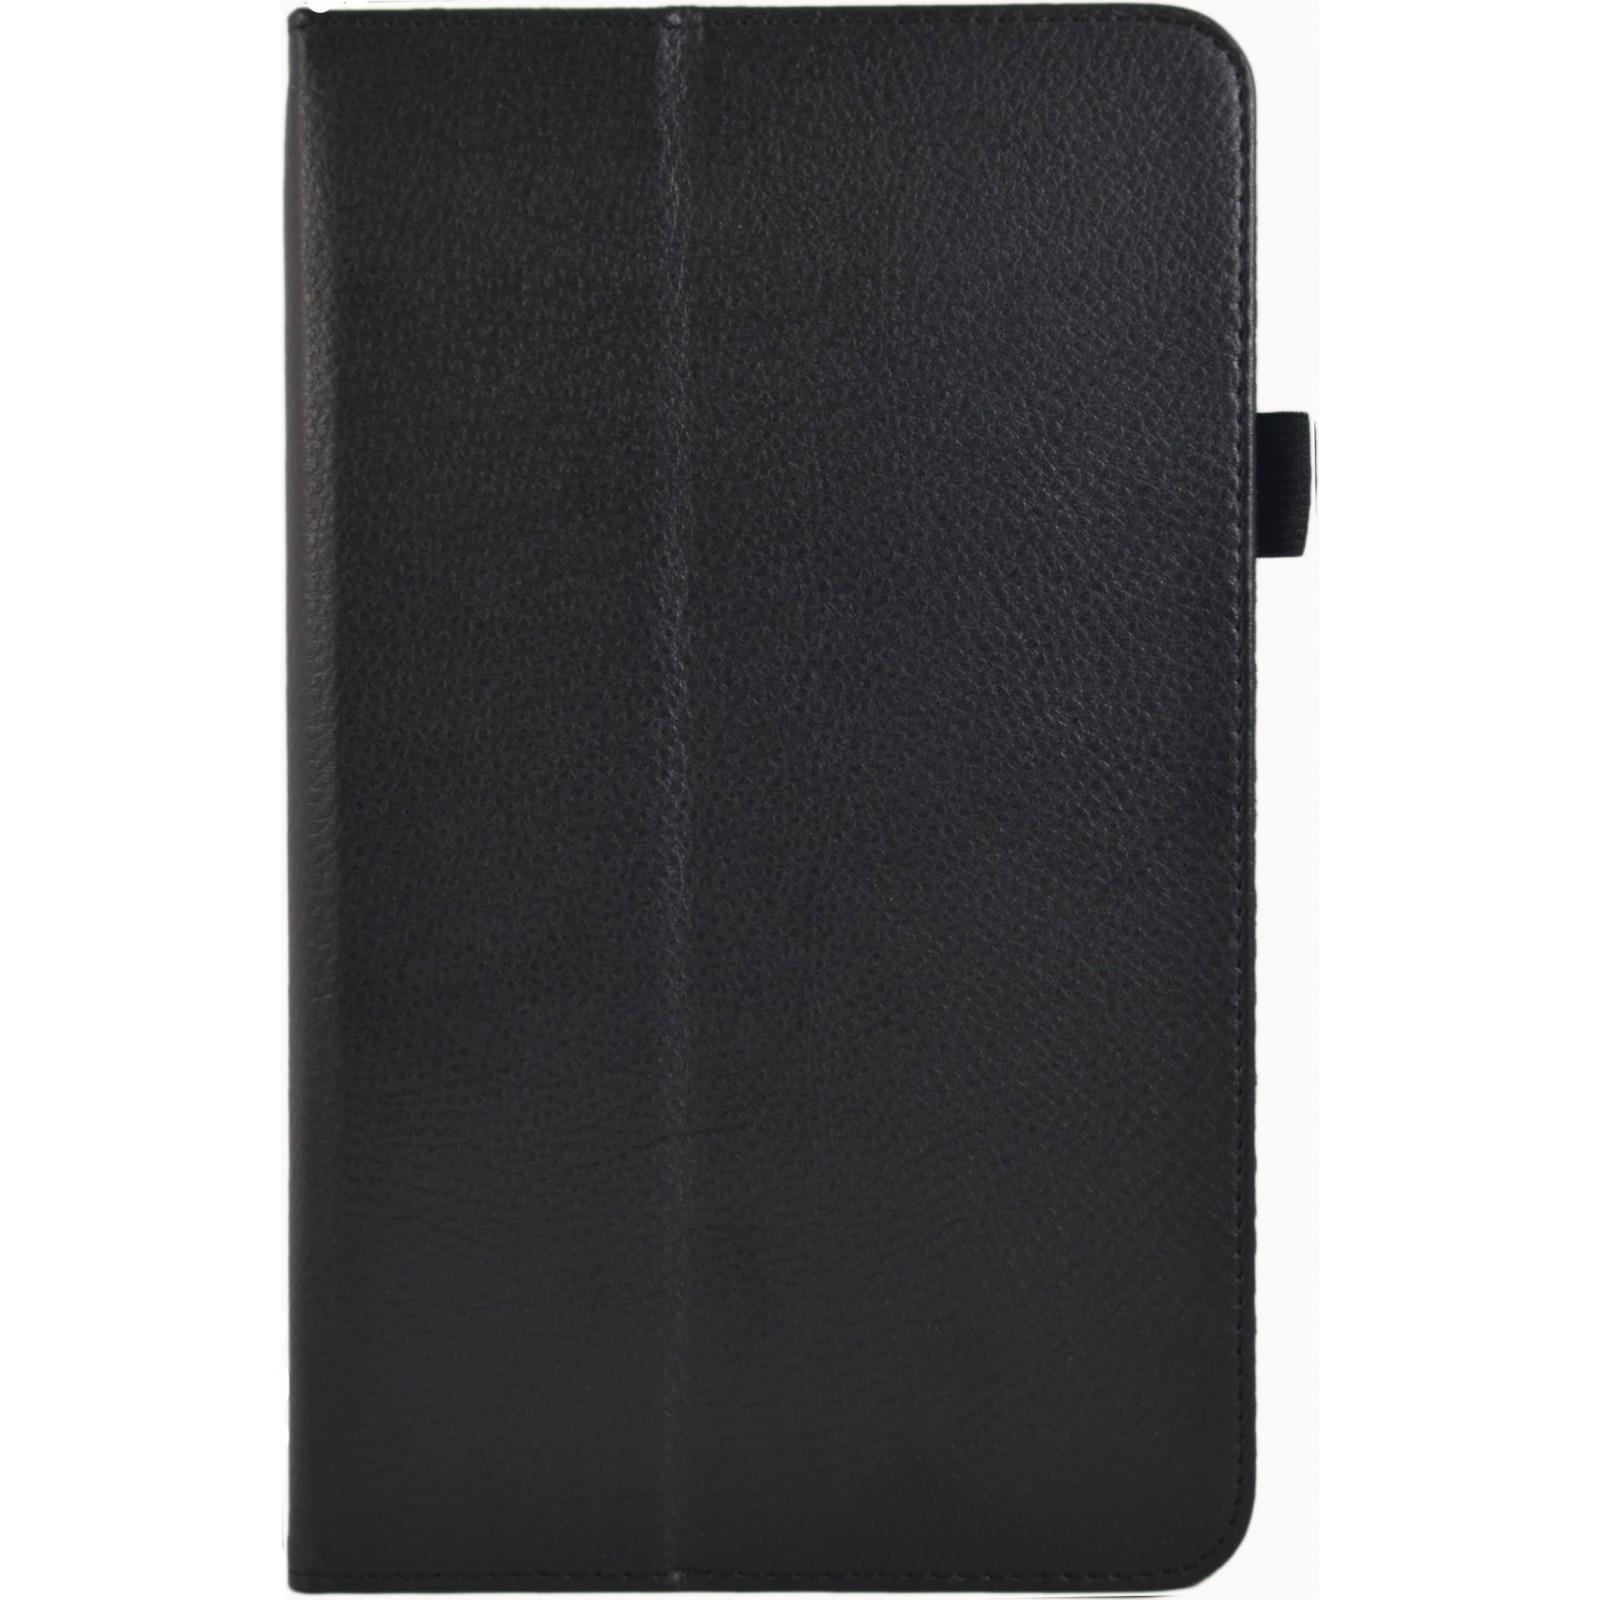 "Чехол для планшета Pro-case 8"" Pro-case Galaxy Tab 3 T3100 8"" (Tab 3 T3100)"